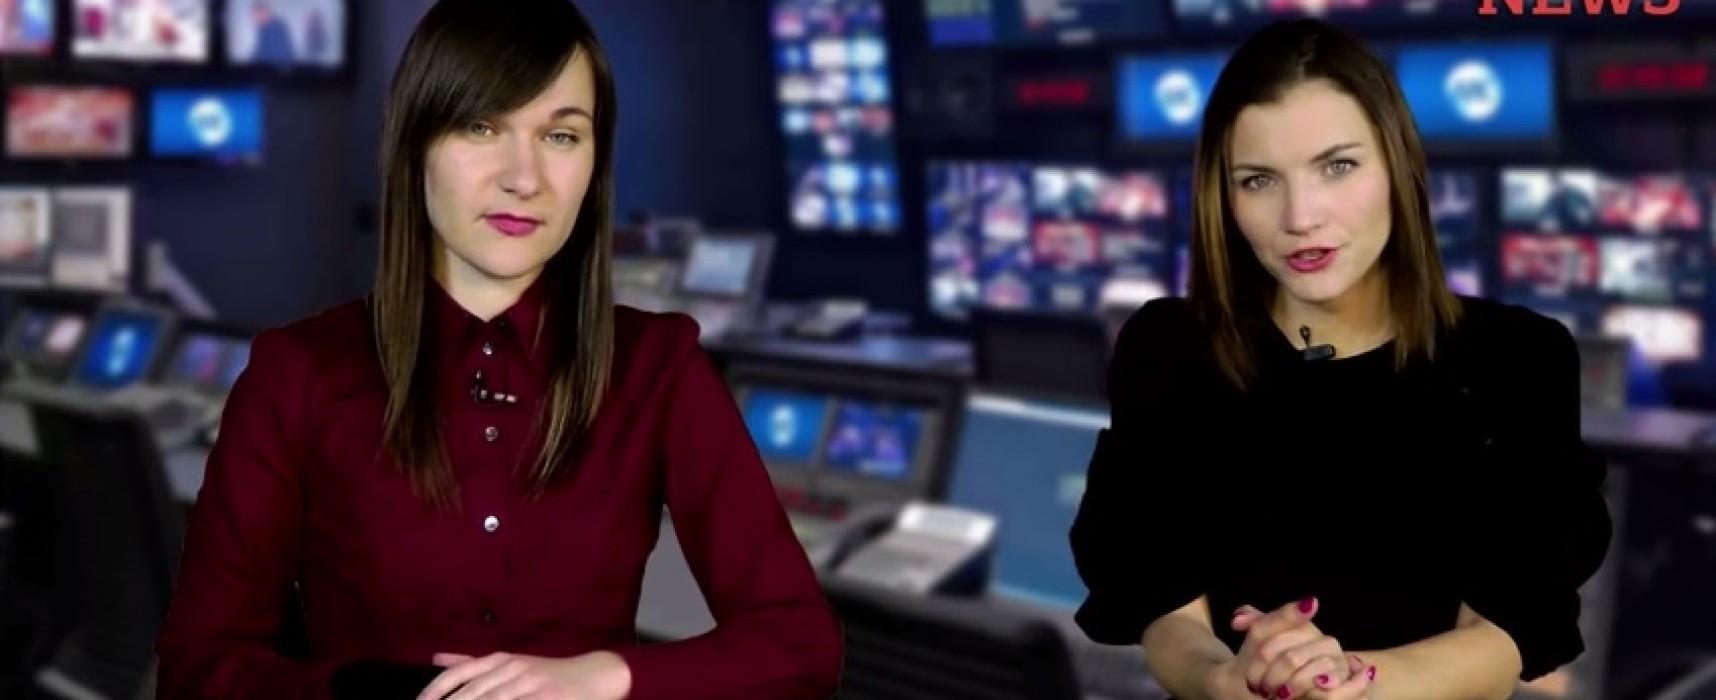 Видеодайджест StopFakeNews #58. Одесса. Спецвыпуск